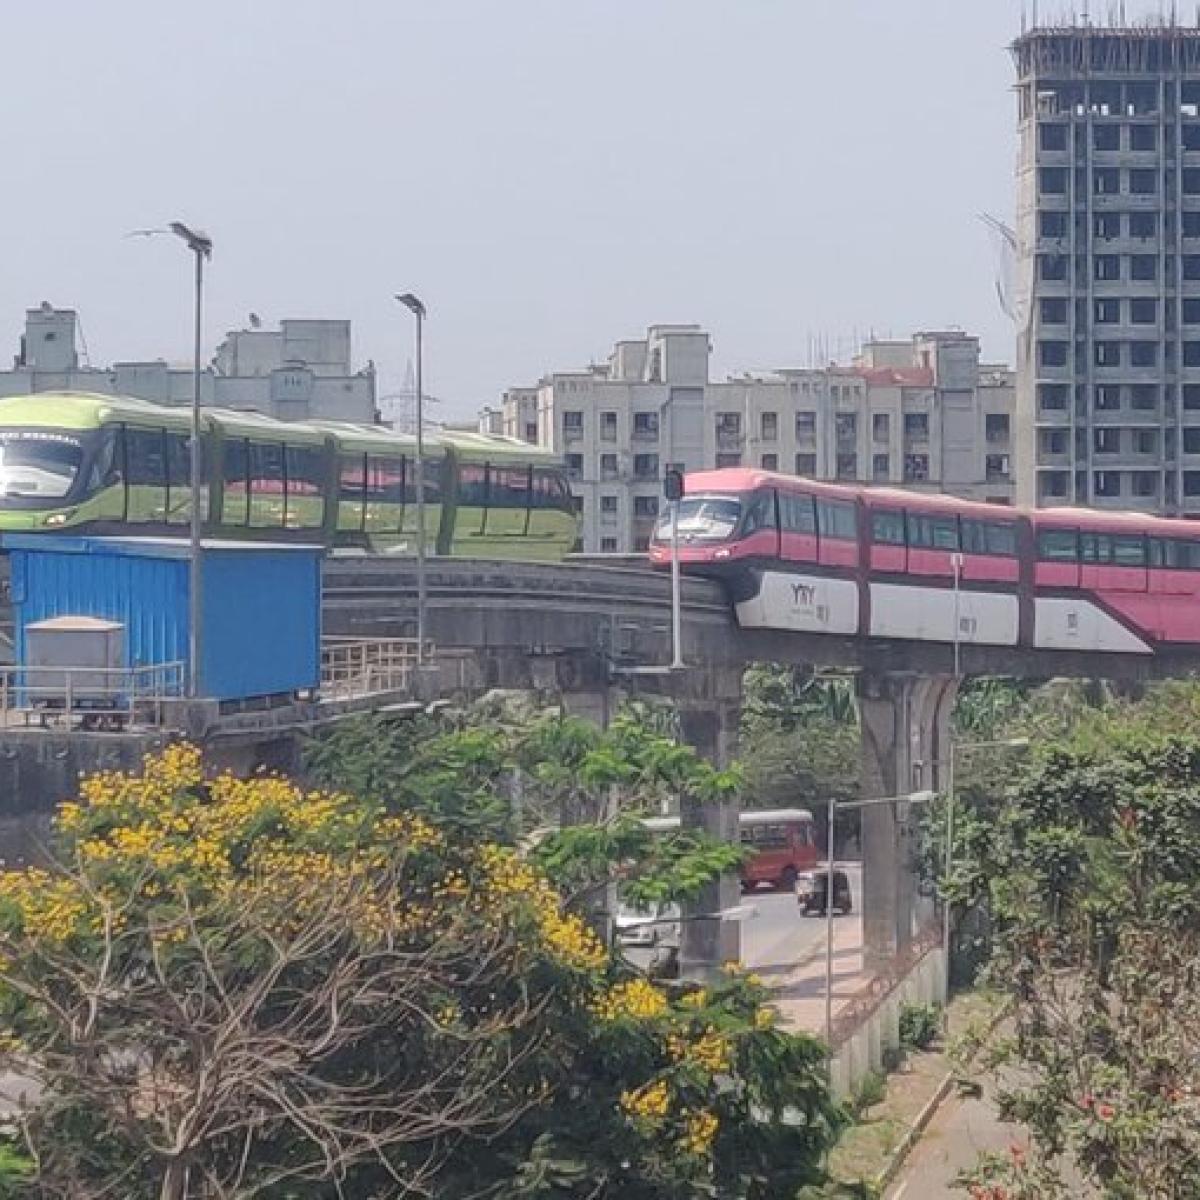 Mumbai: Despite Monorail failure in city, NMMC plans one